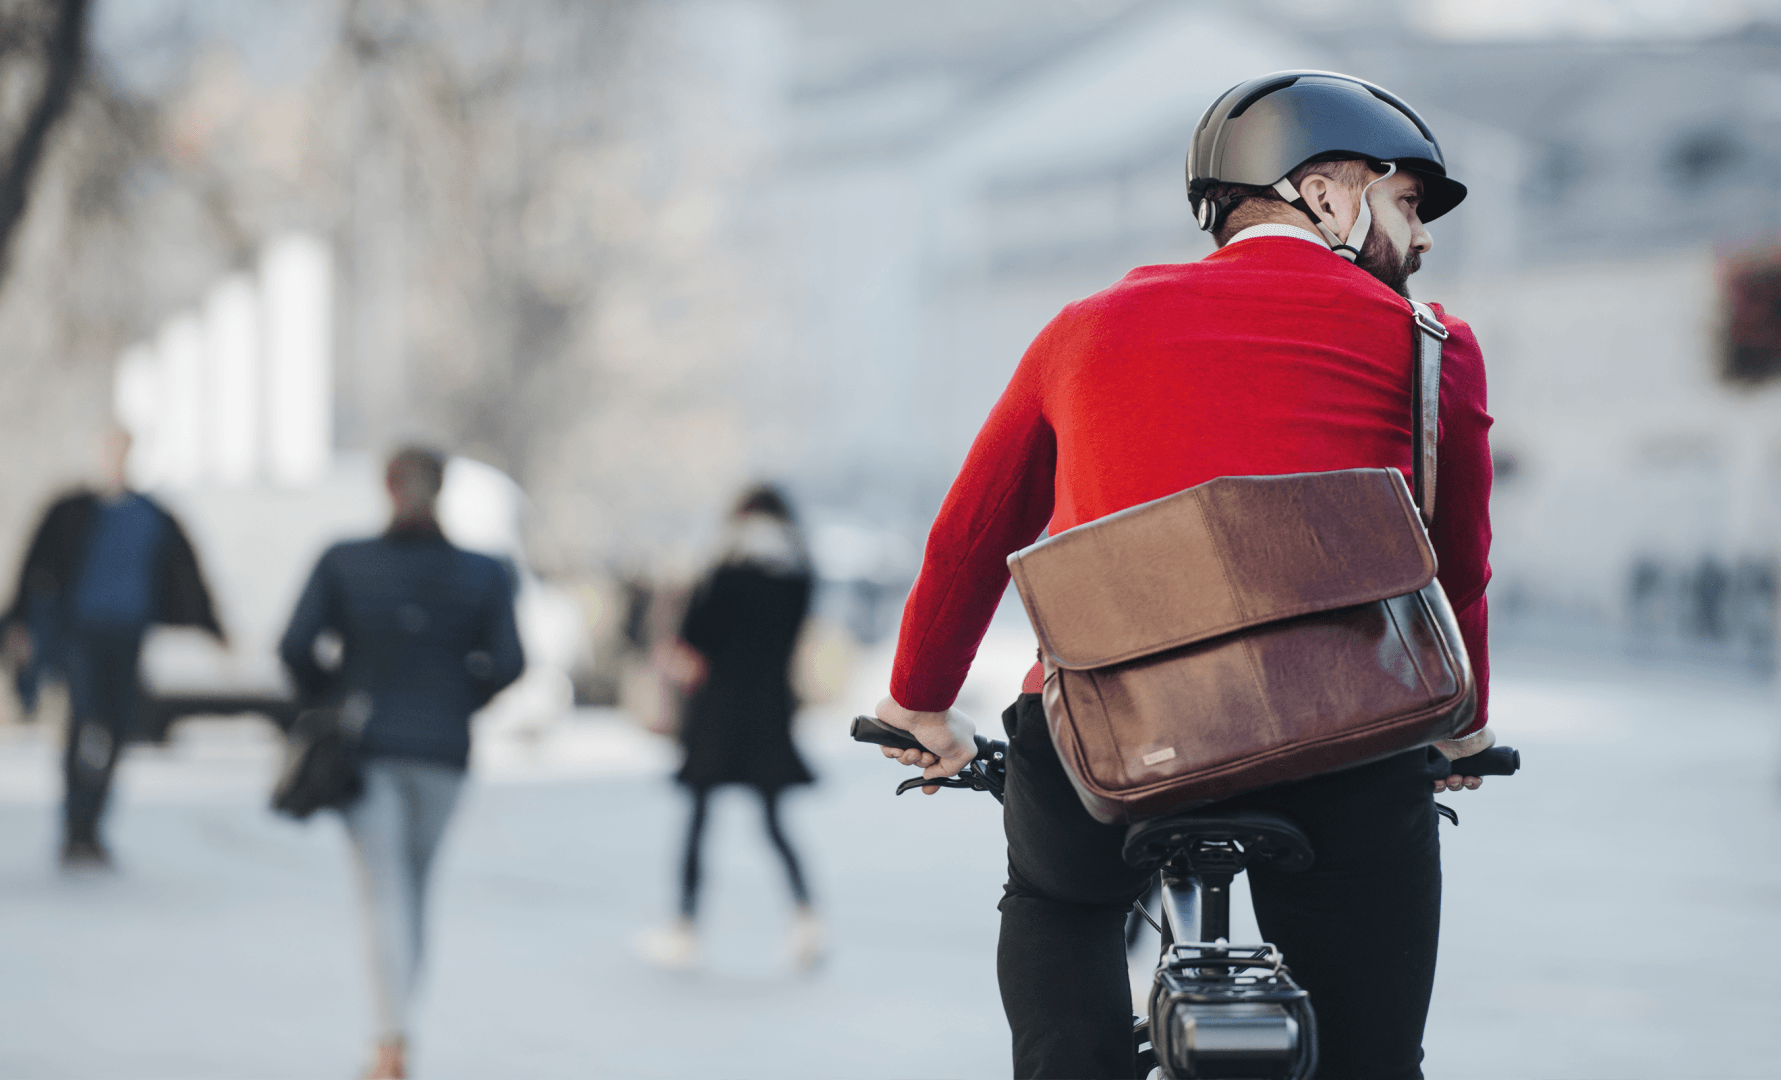 man-on-bike-decarbonising-transport.png